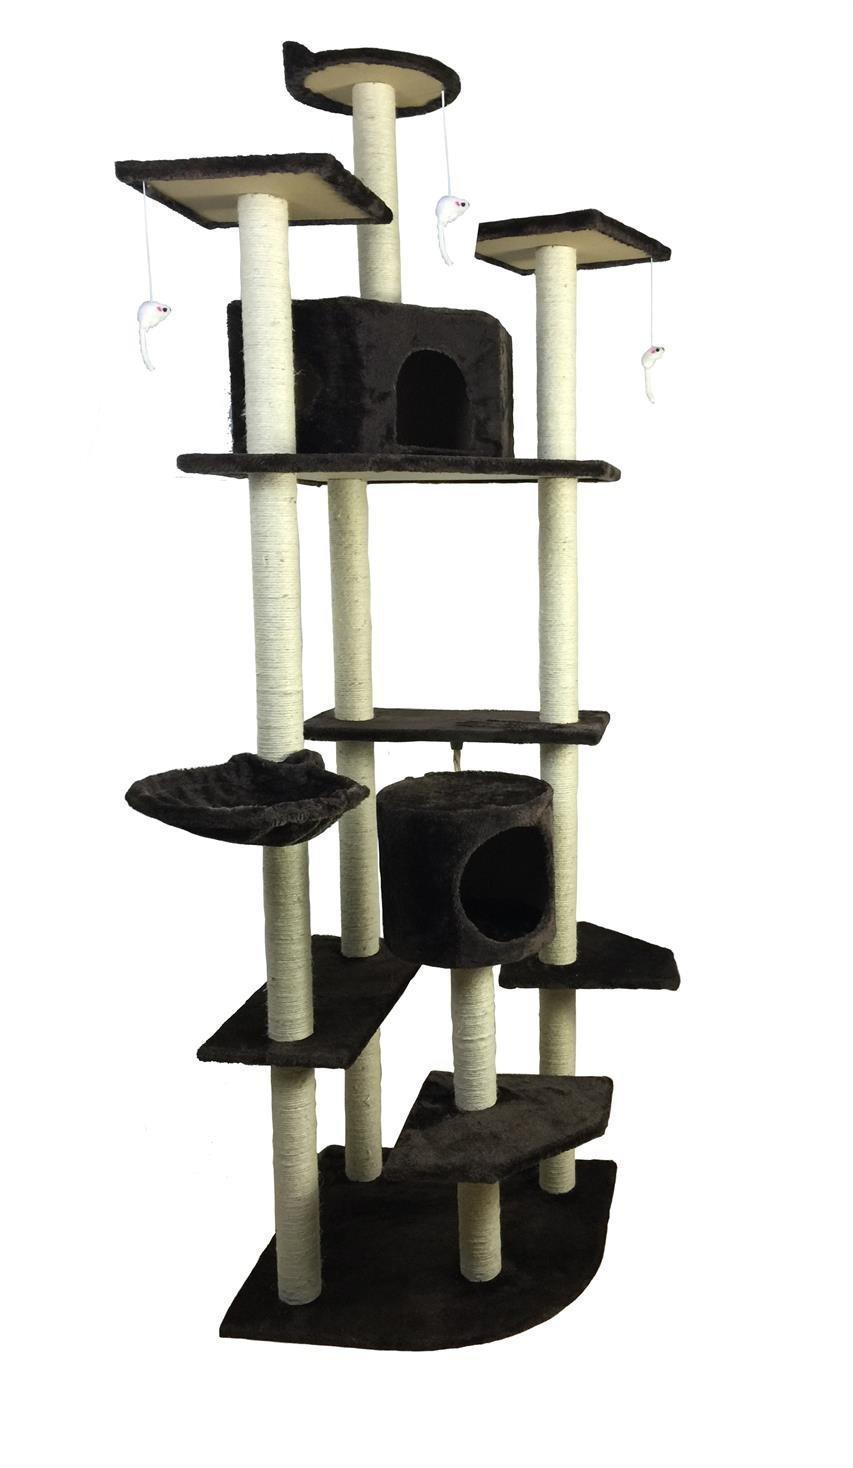 iPet Cat Tree Condo Furniture Cat Scratch Post Pet House, Brown